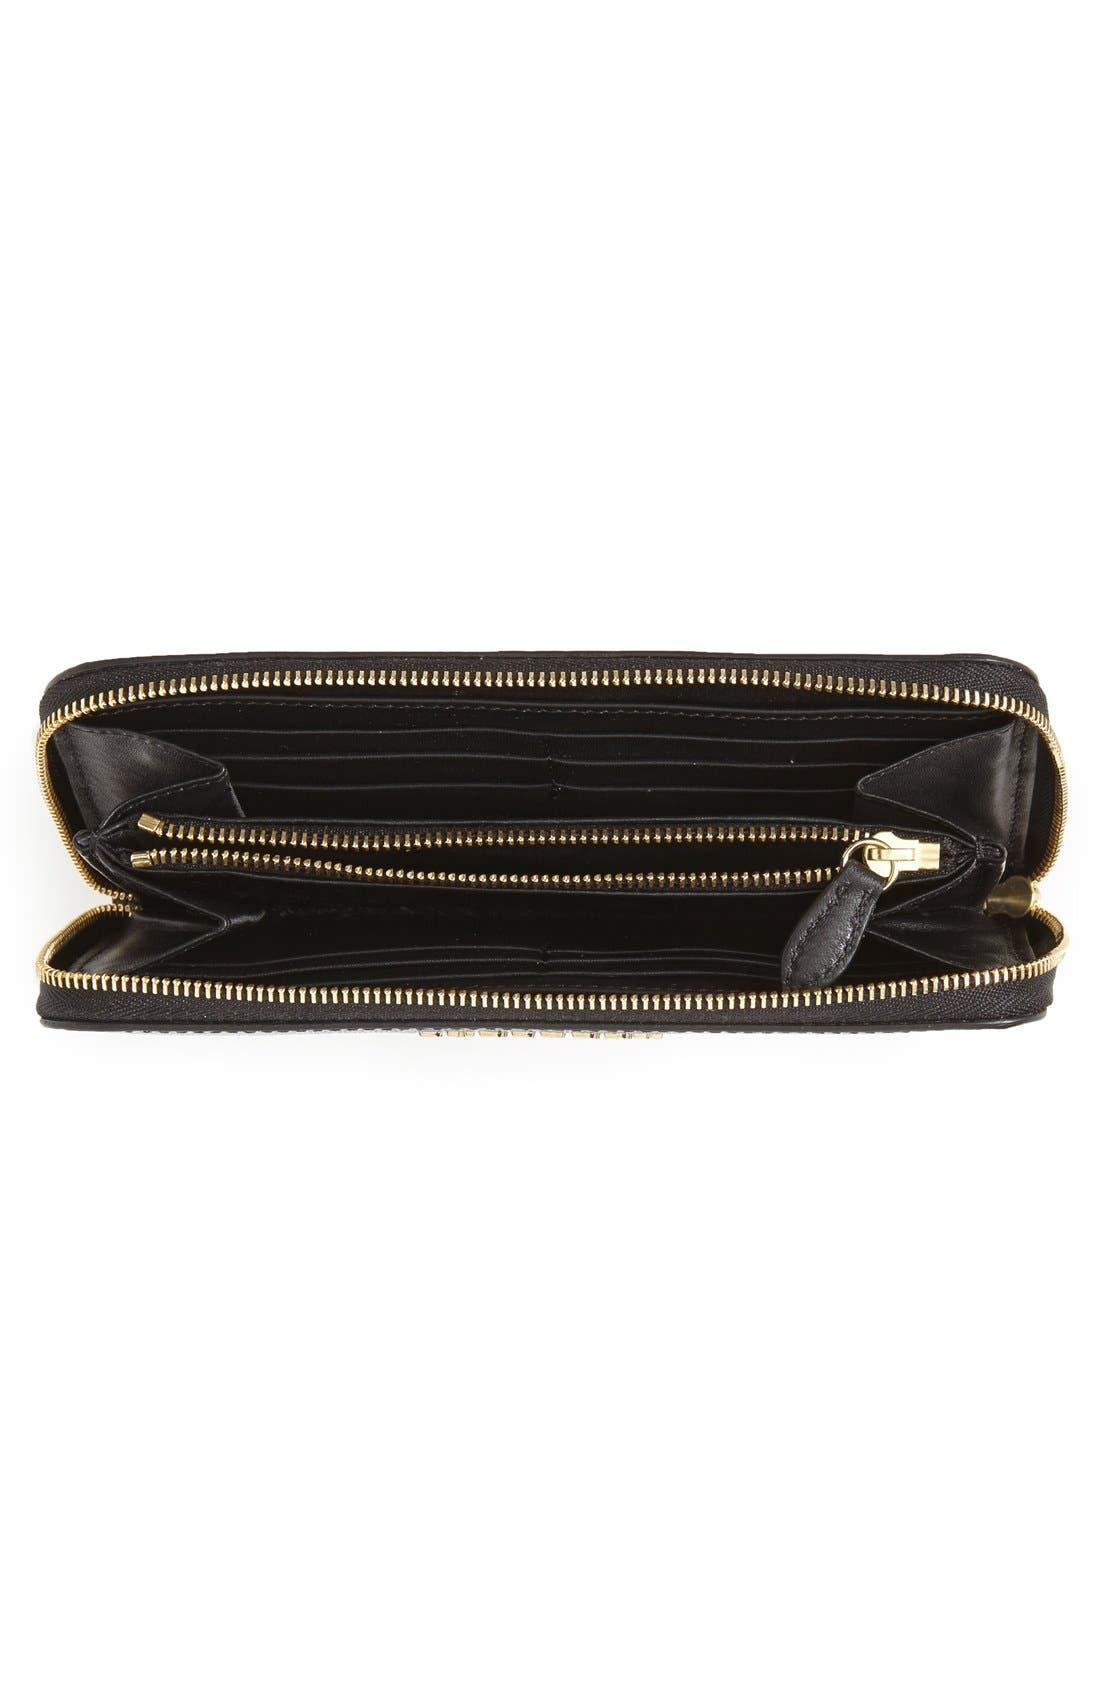 BURBERRY,                             'Elmore - London Leather' Zip Around Wallet,                             Alternate thumbnail 3, color,                             001